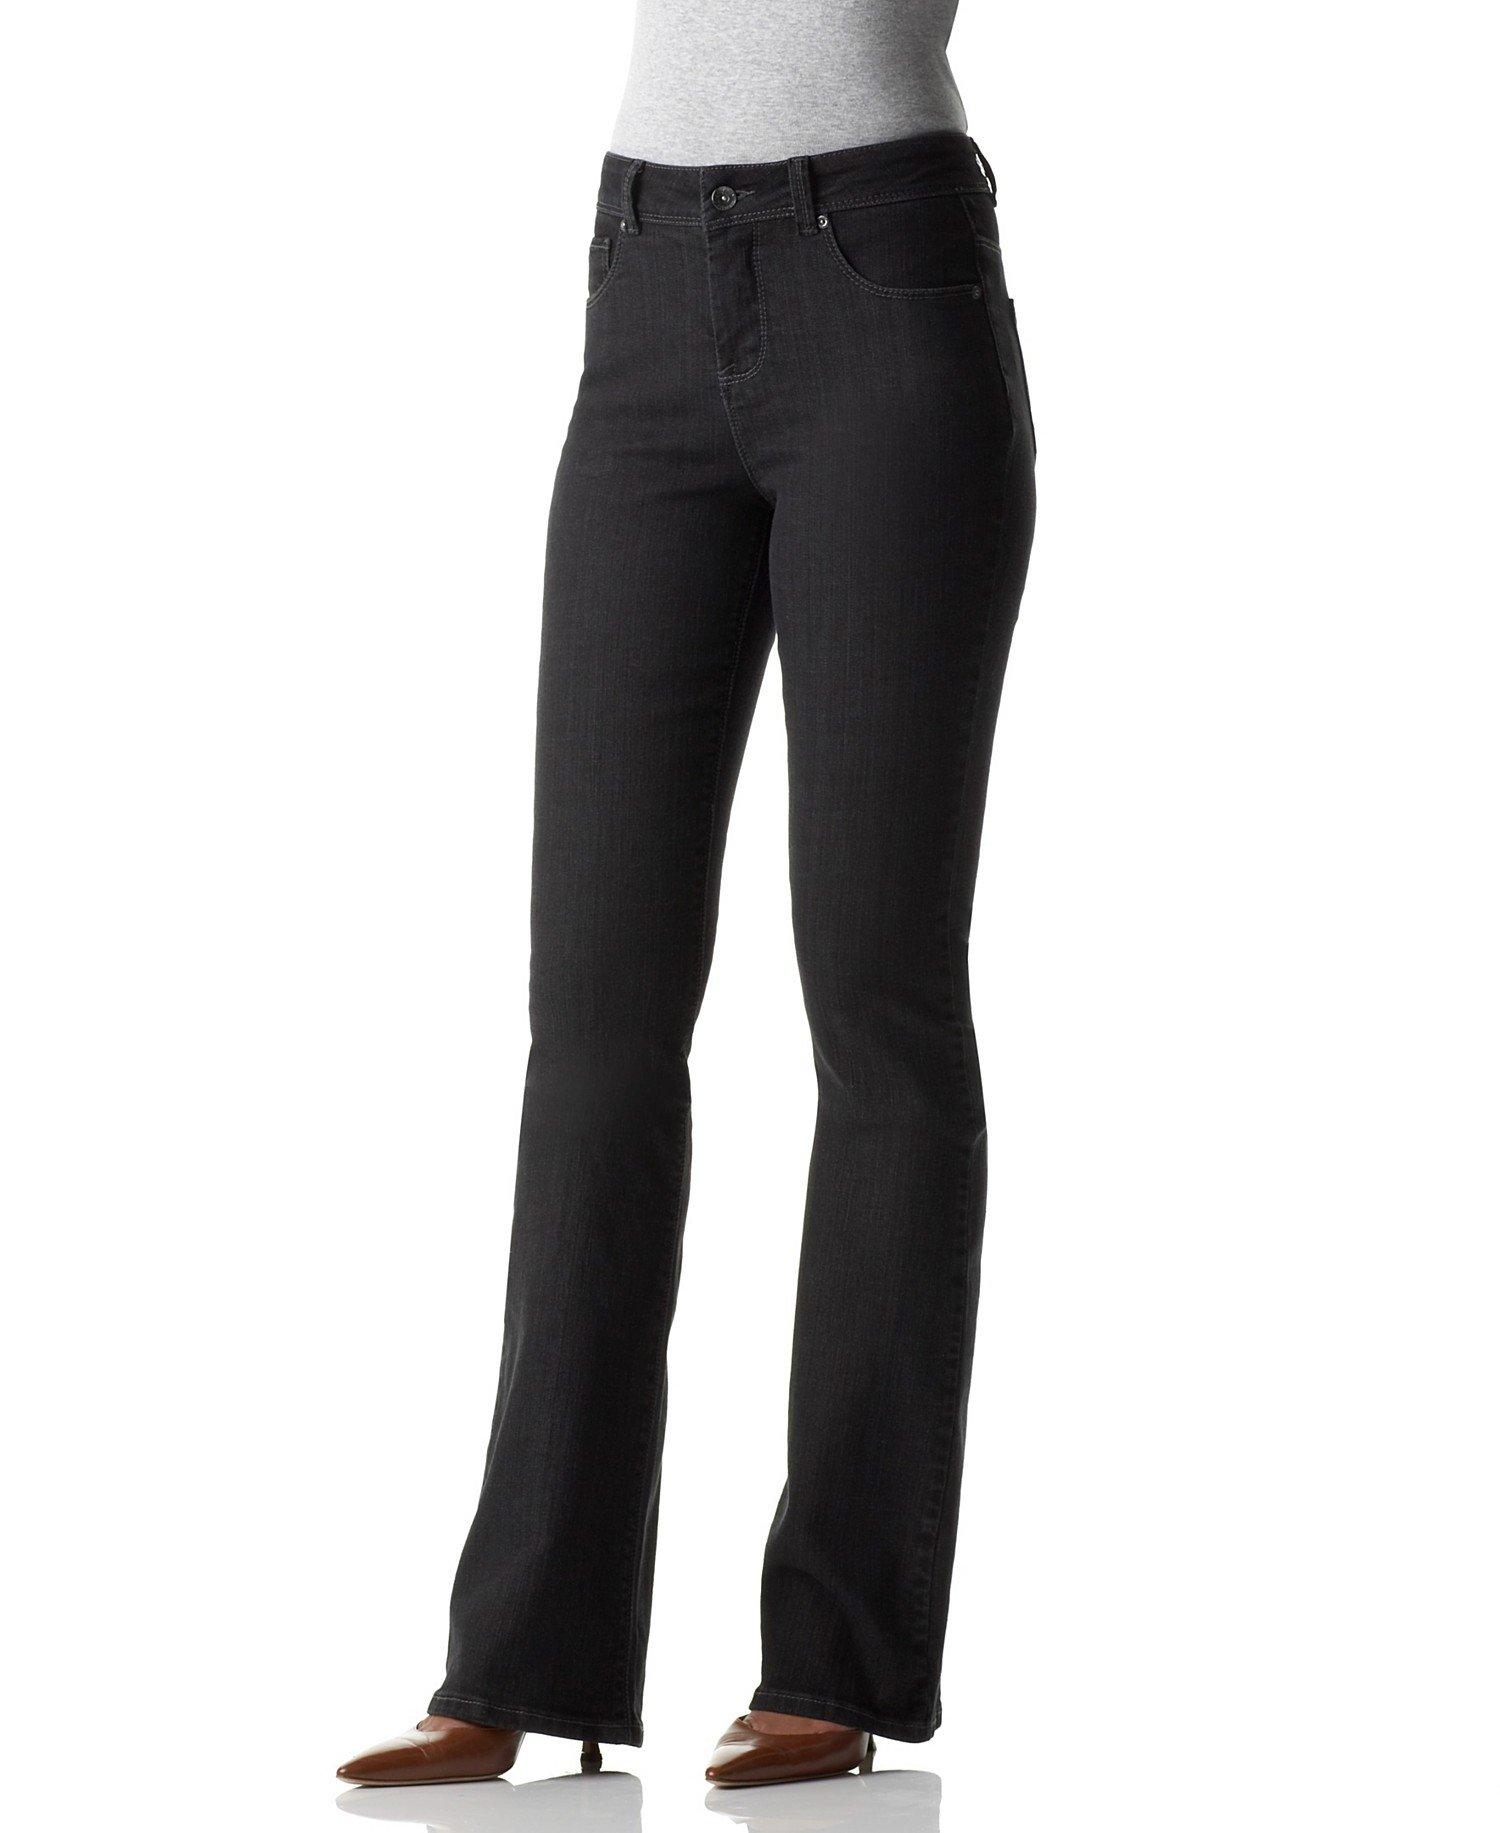 Style&Co Women's Tummy Control Boot Cut Jeans 4 Short Black Tint